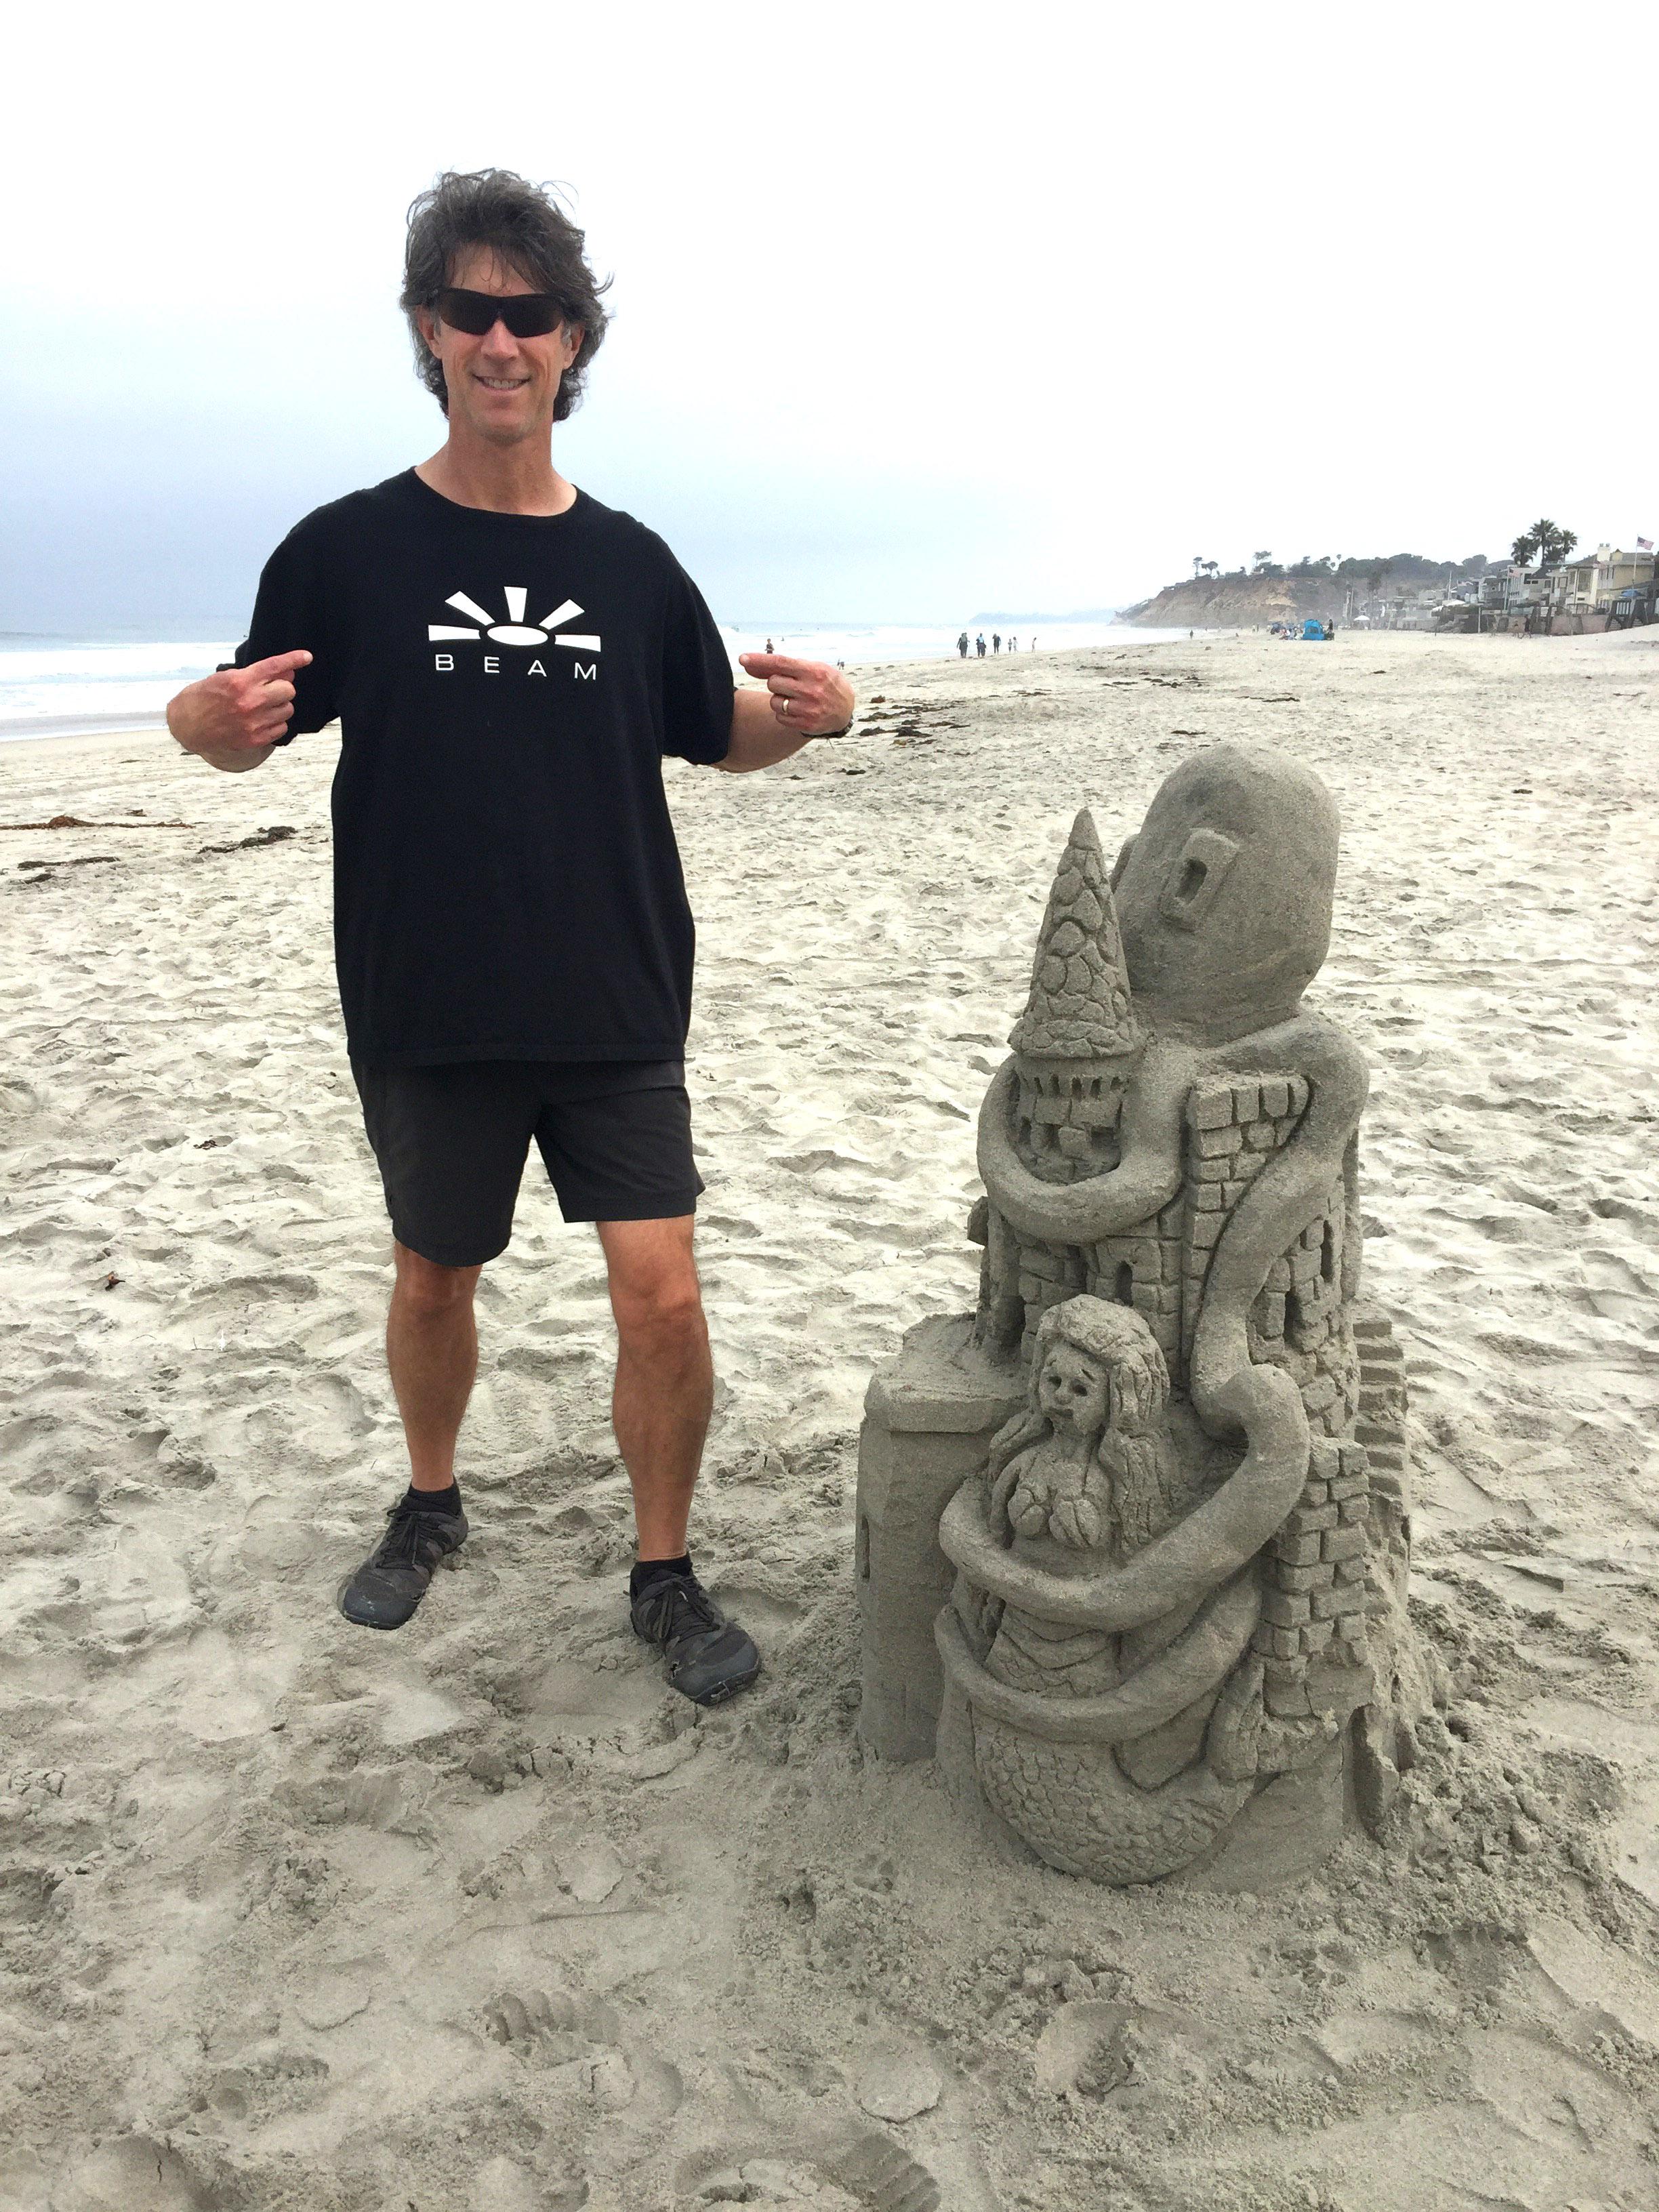 Rich Trissel - CaliforniaRich 'BEAMs' next to his impressive sand creation on the beach in Del Mar, California.